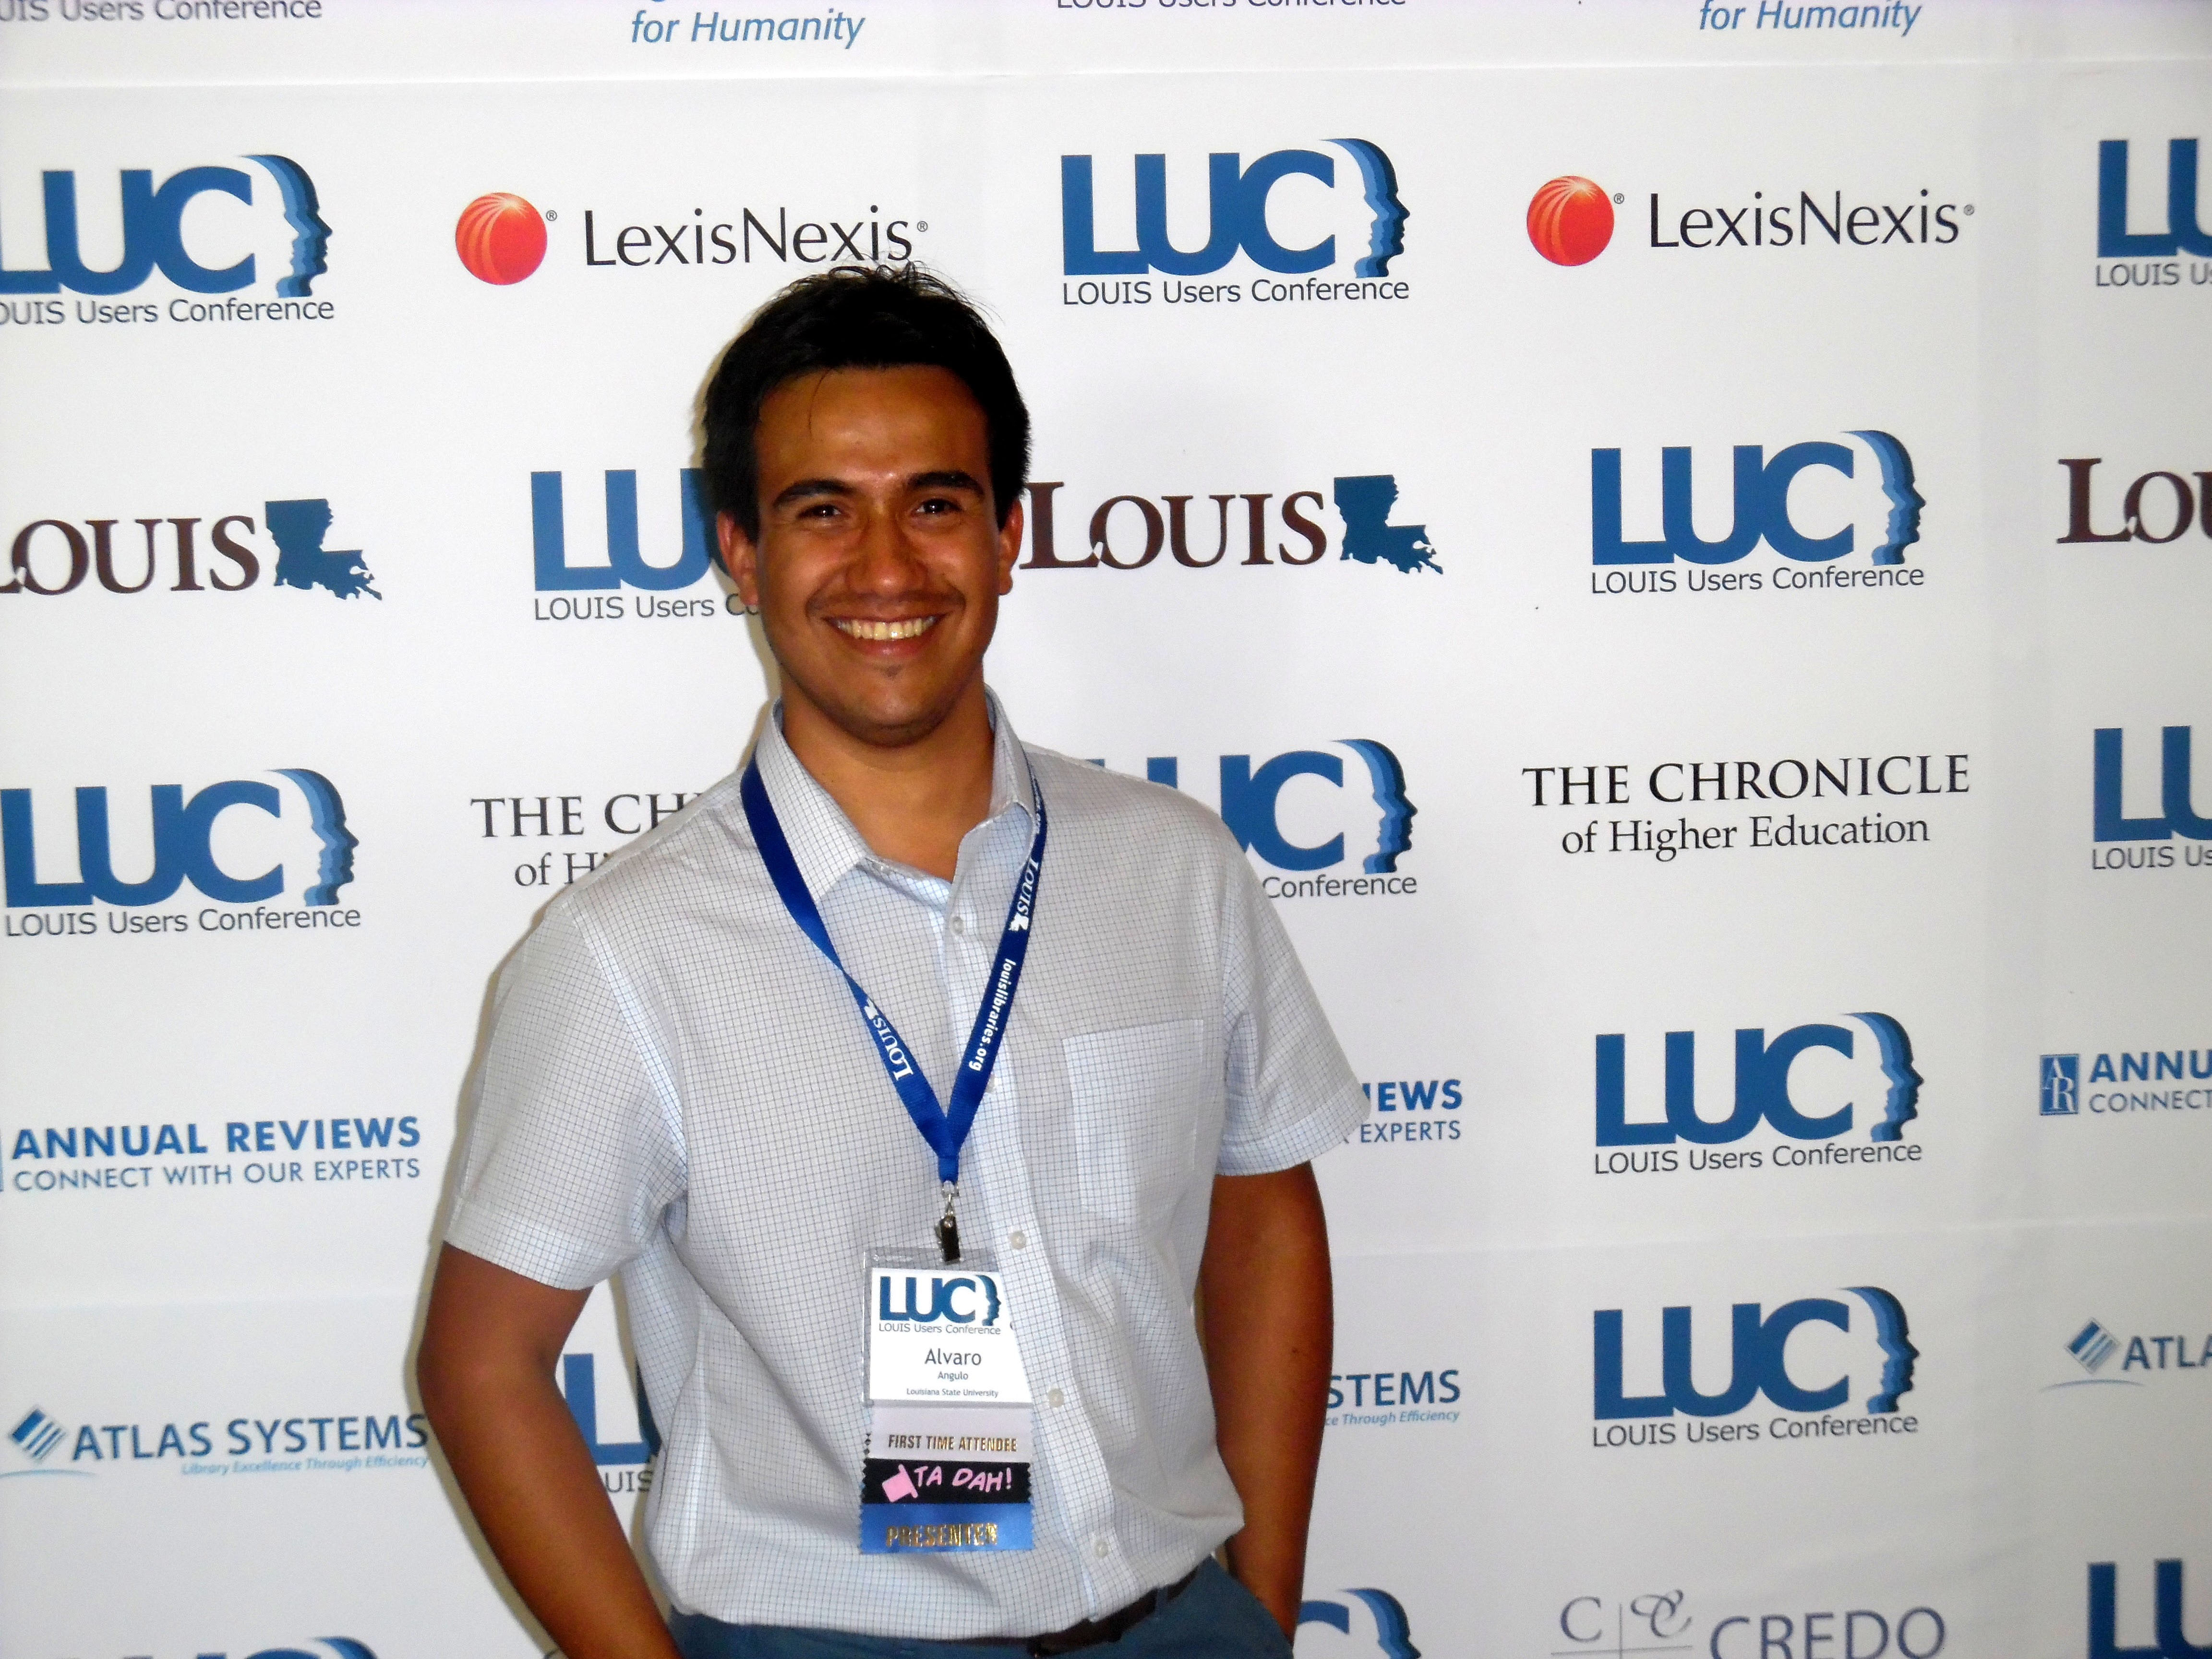 LUC 2016